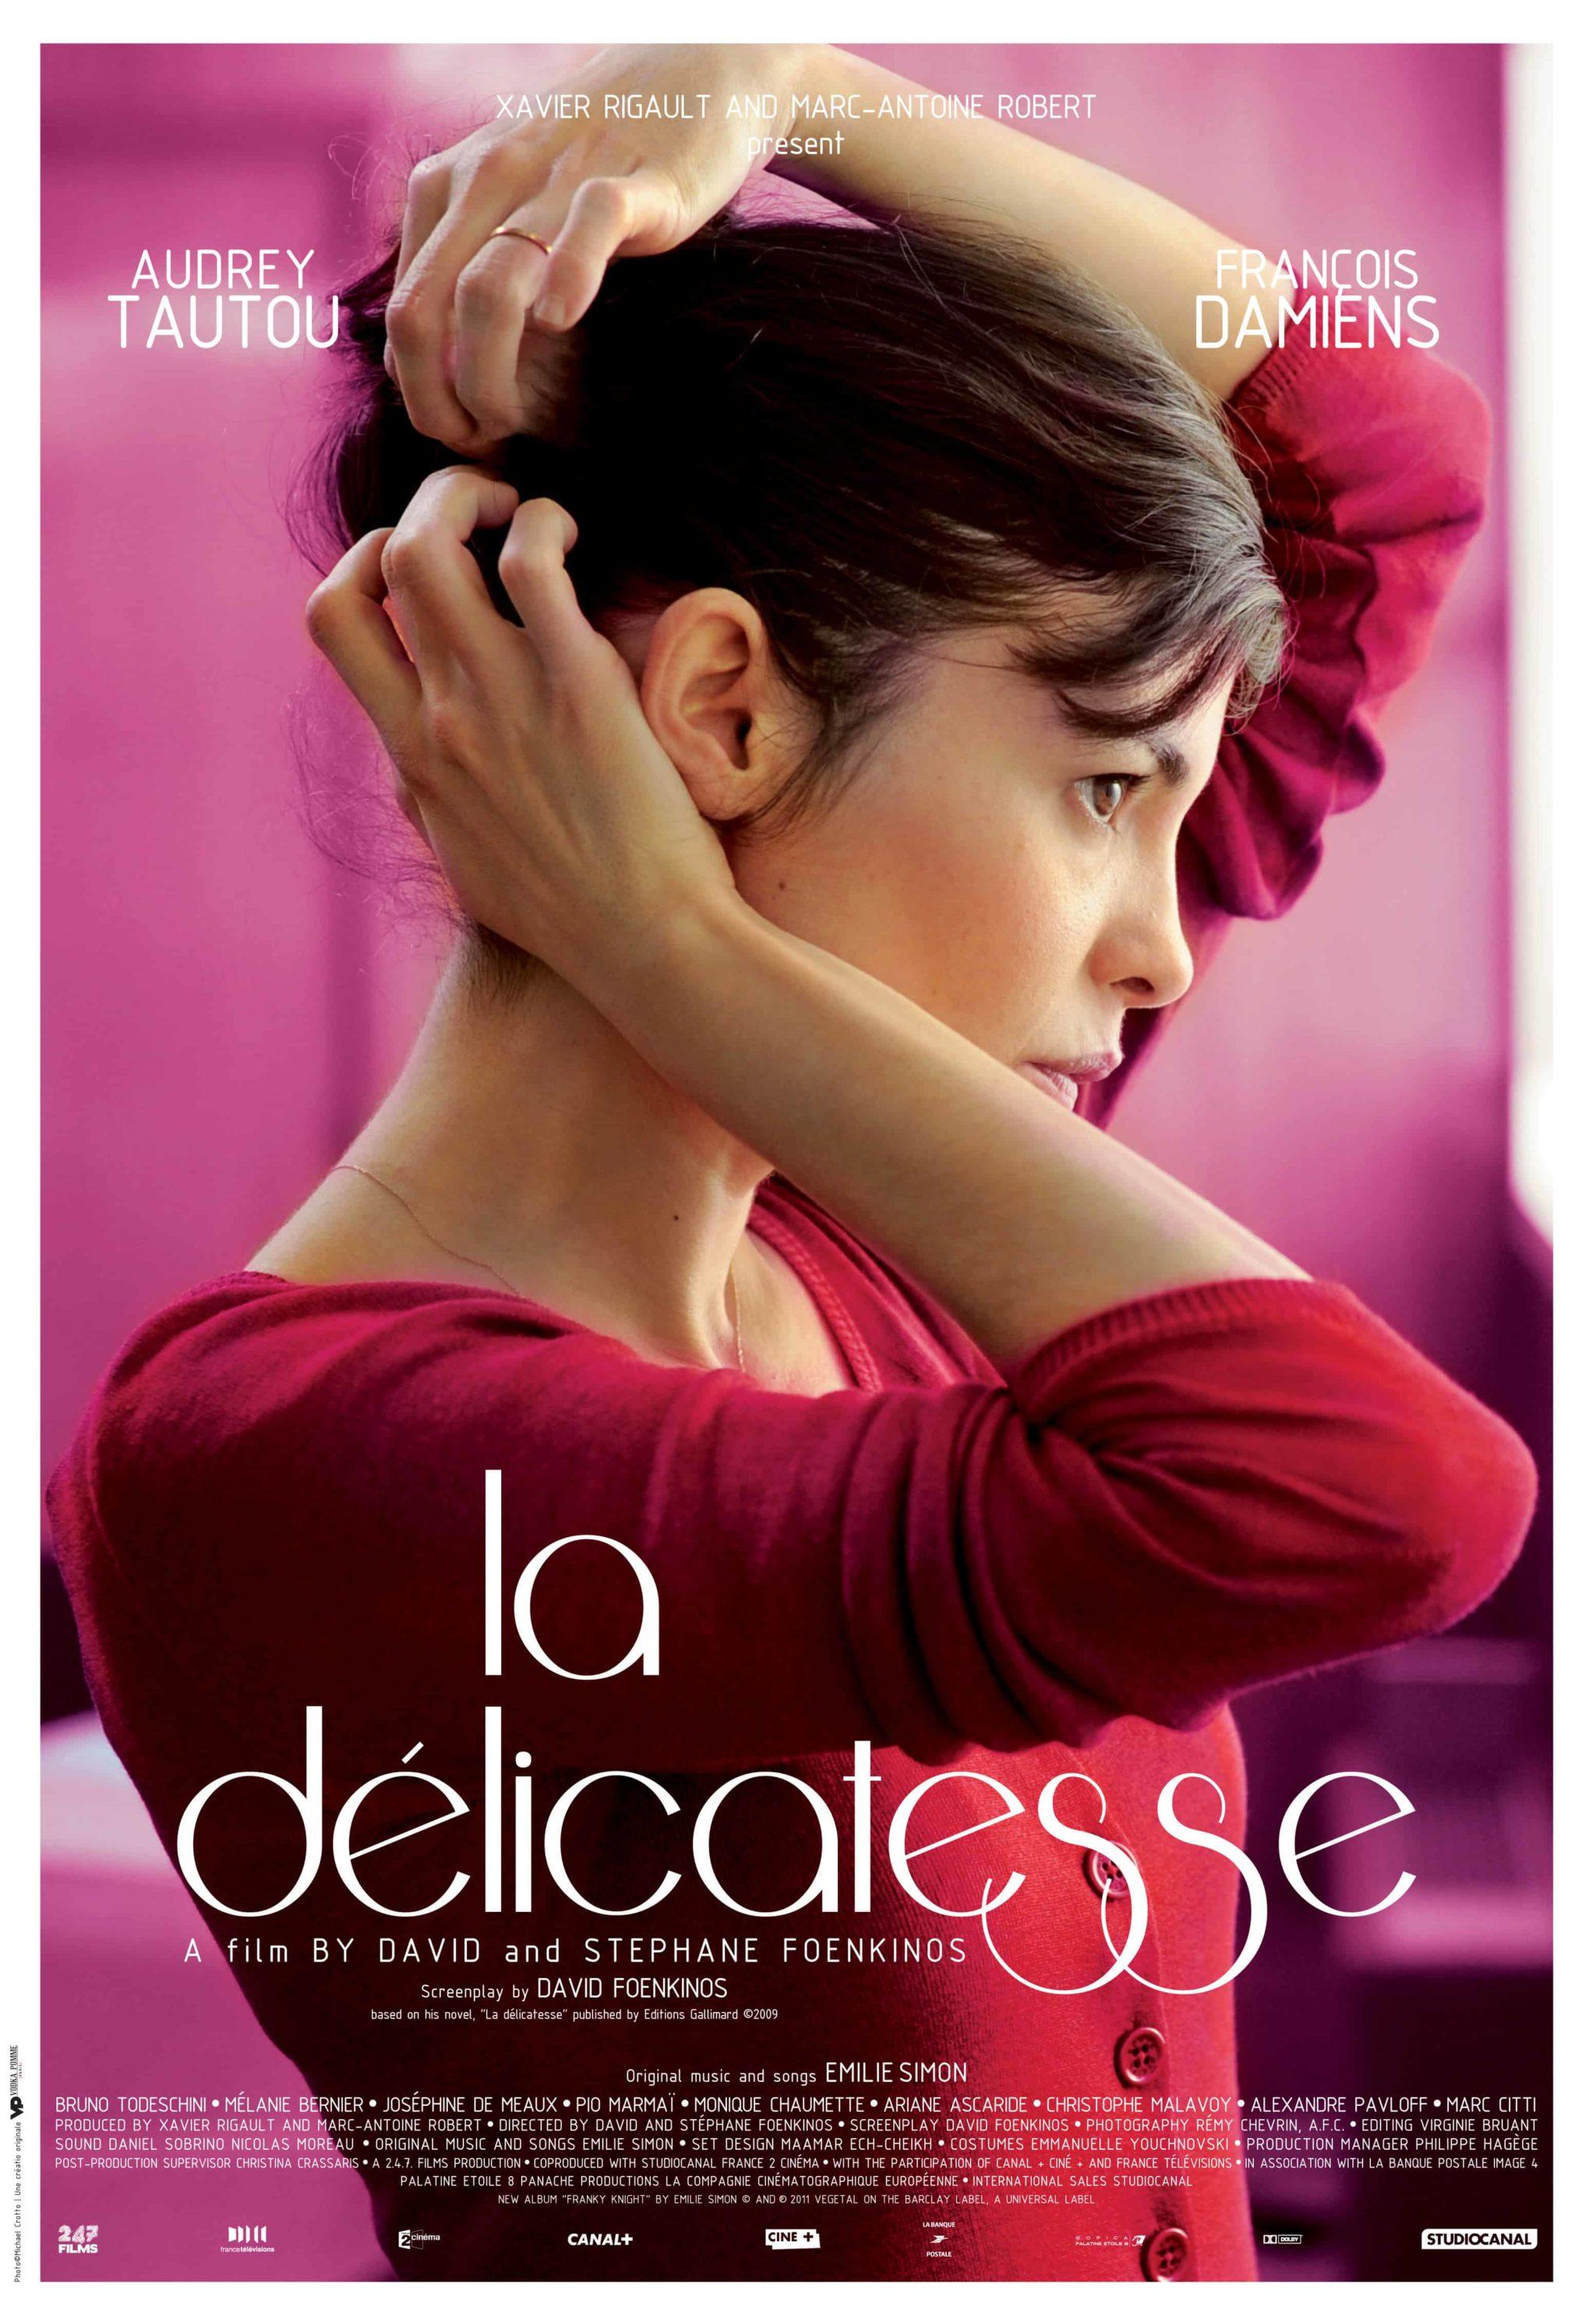 La delicadeza, Tour de cine frances